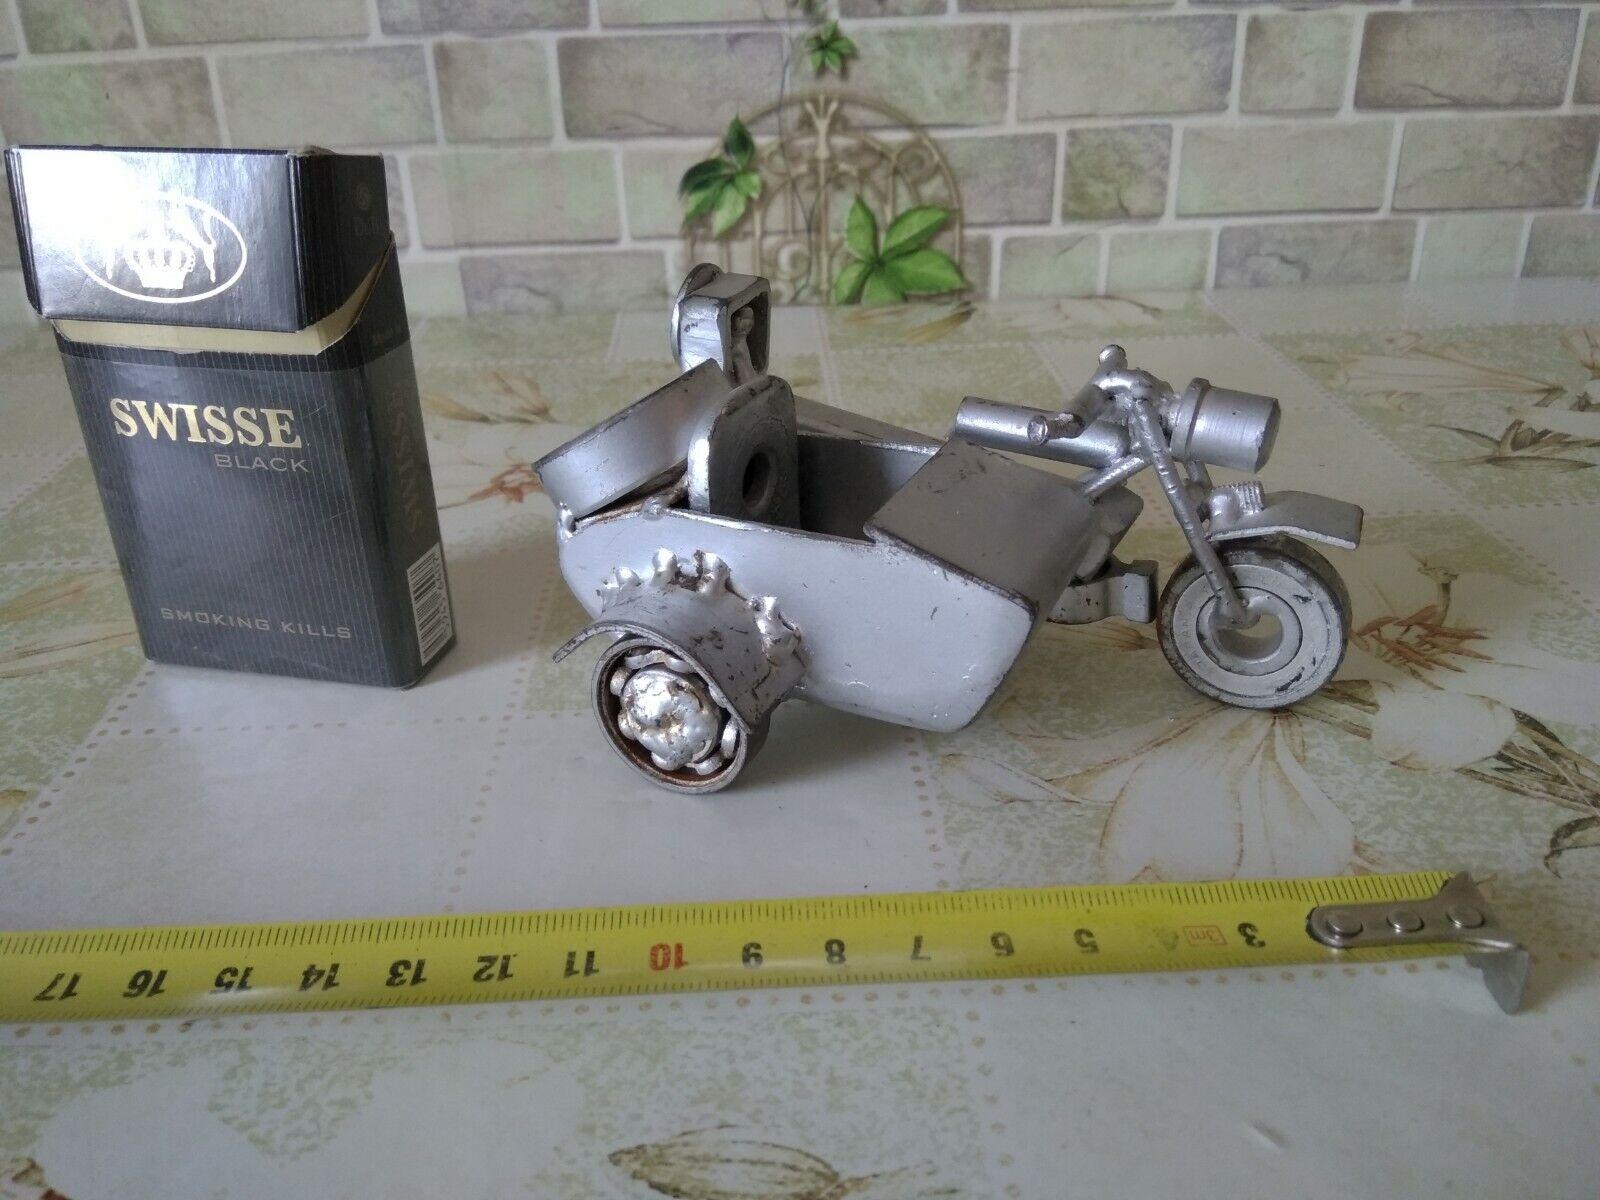 Vintage Moto Bicicleta URSS Harley Davidson Estaño Juguete Hojalata Coche Hecho a Mano